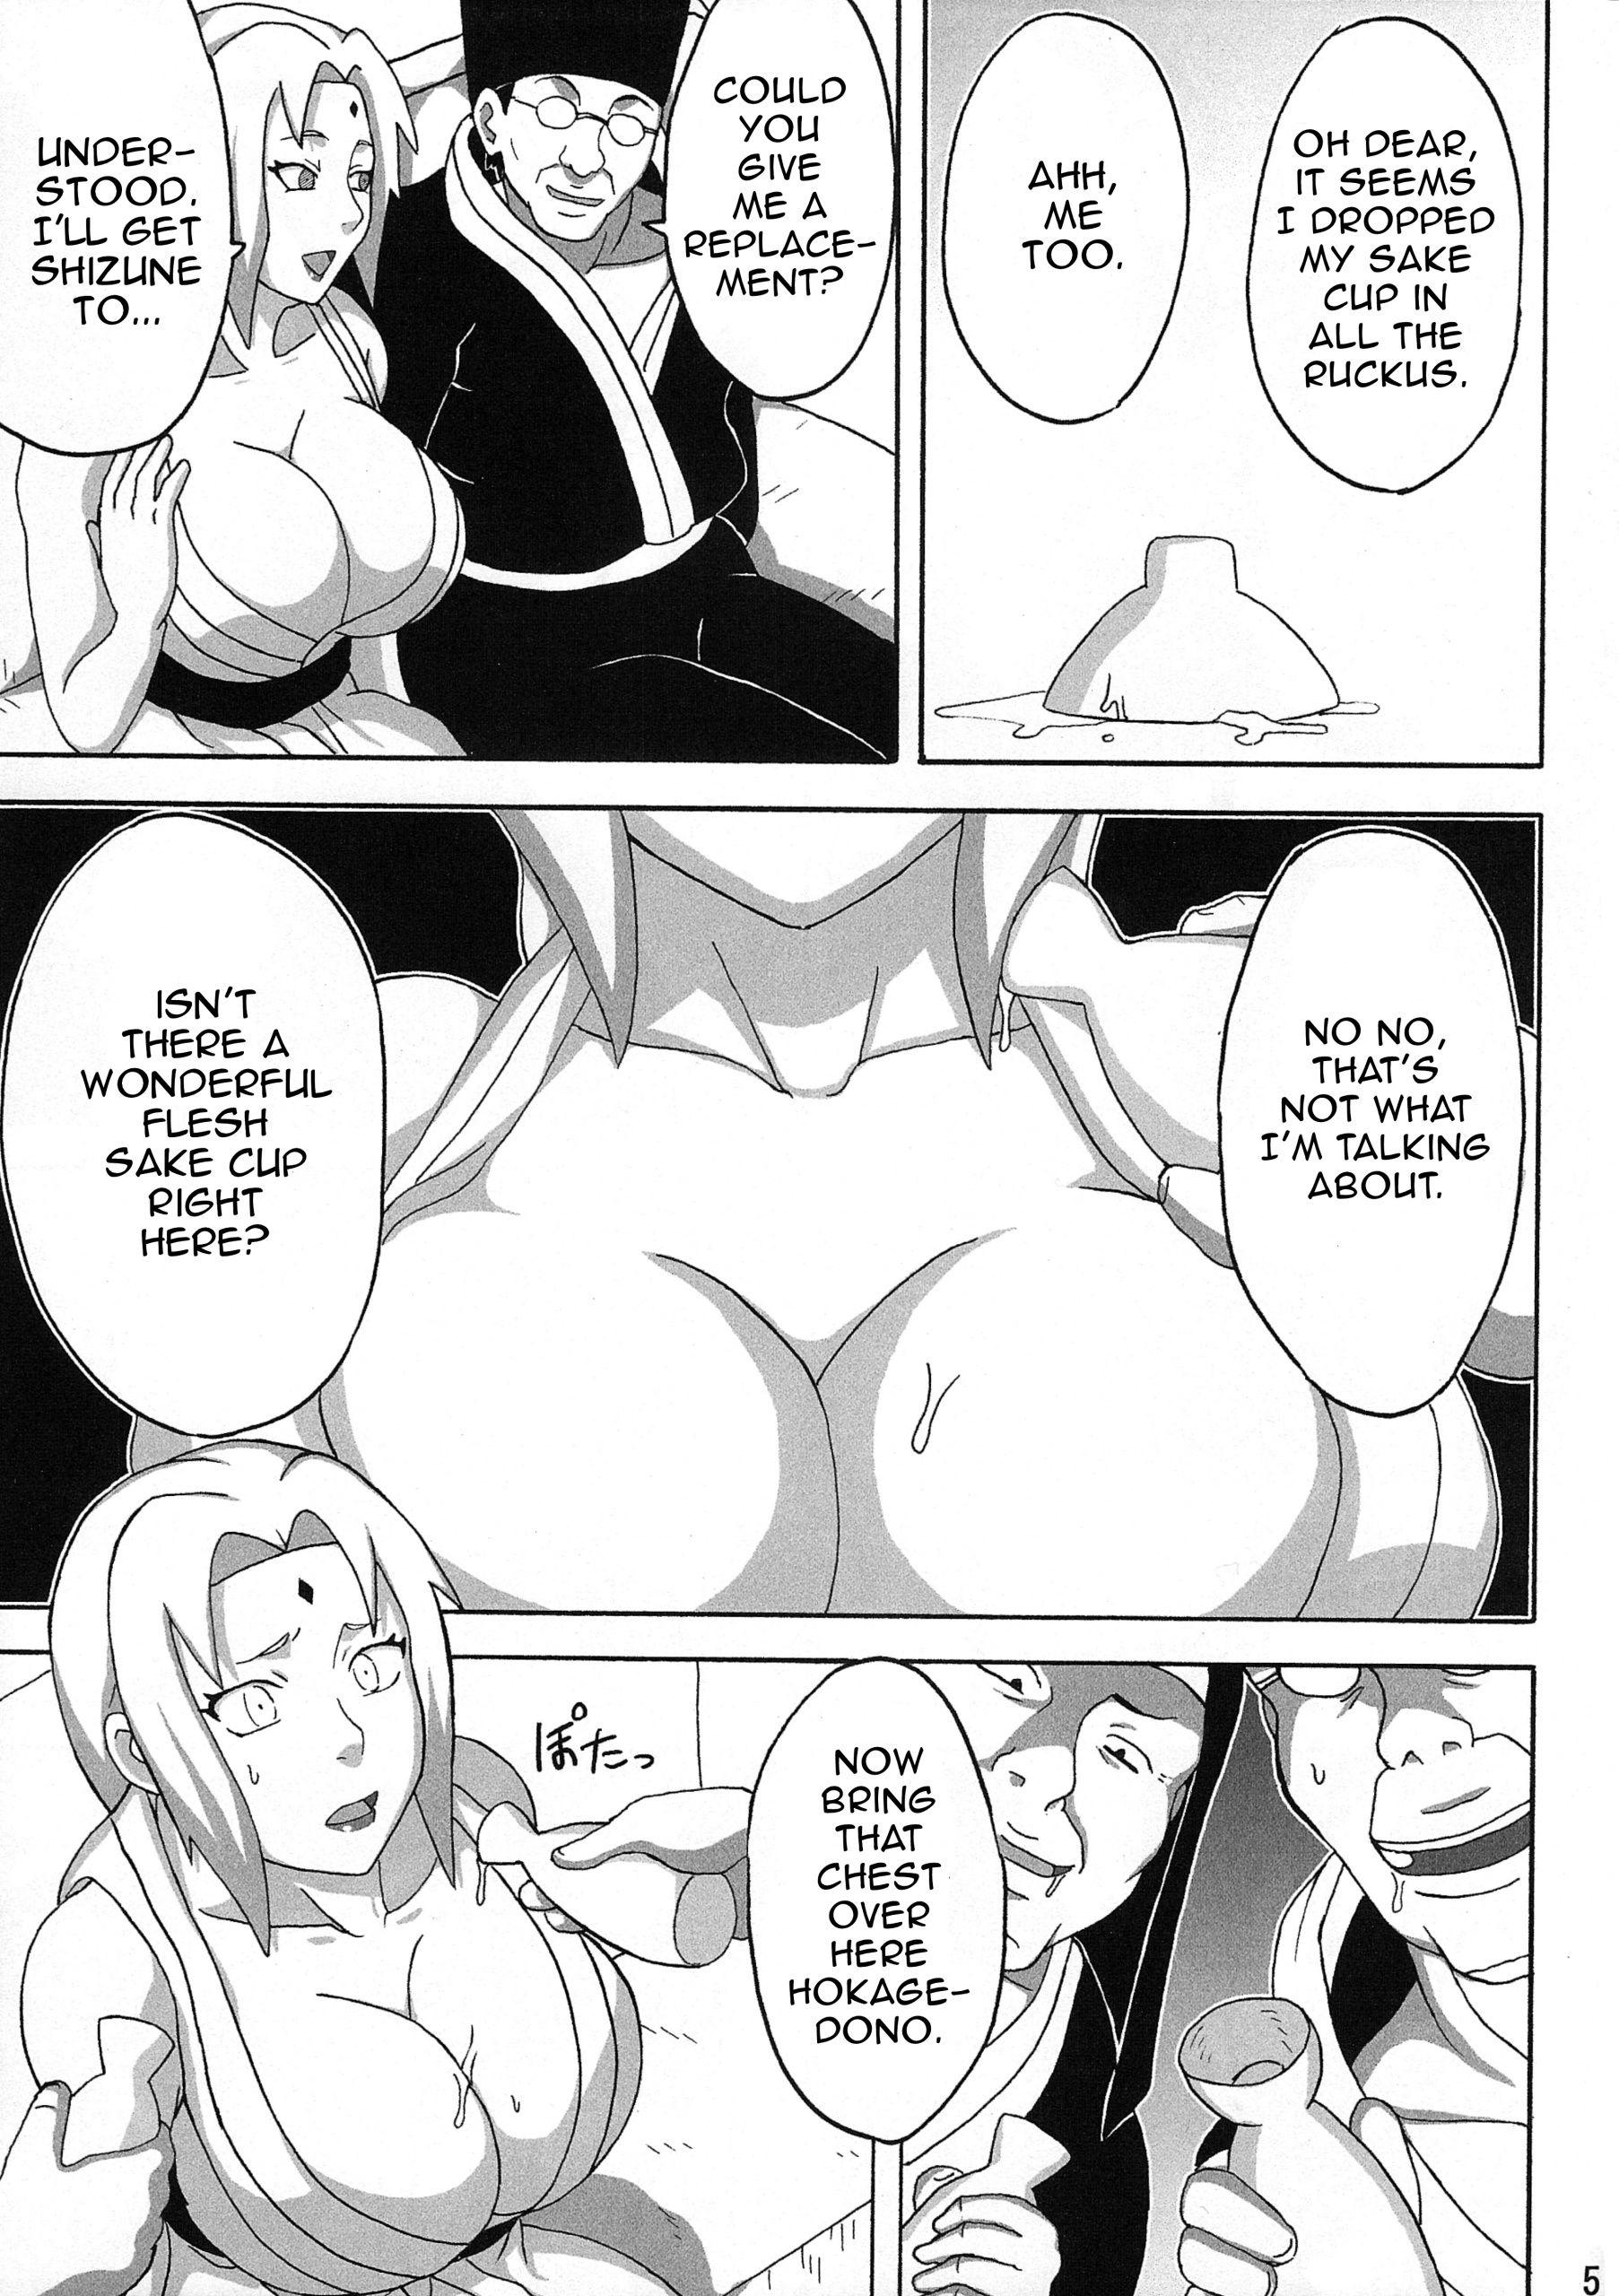 Tsunades lewd reception party hentai manga picture 6